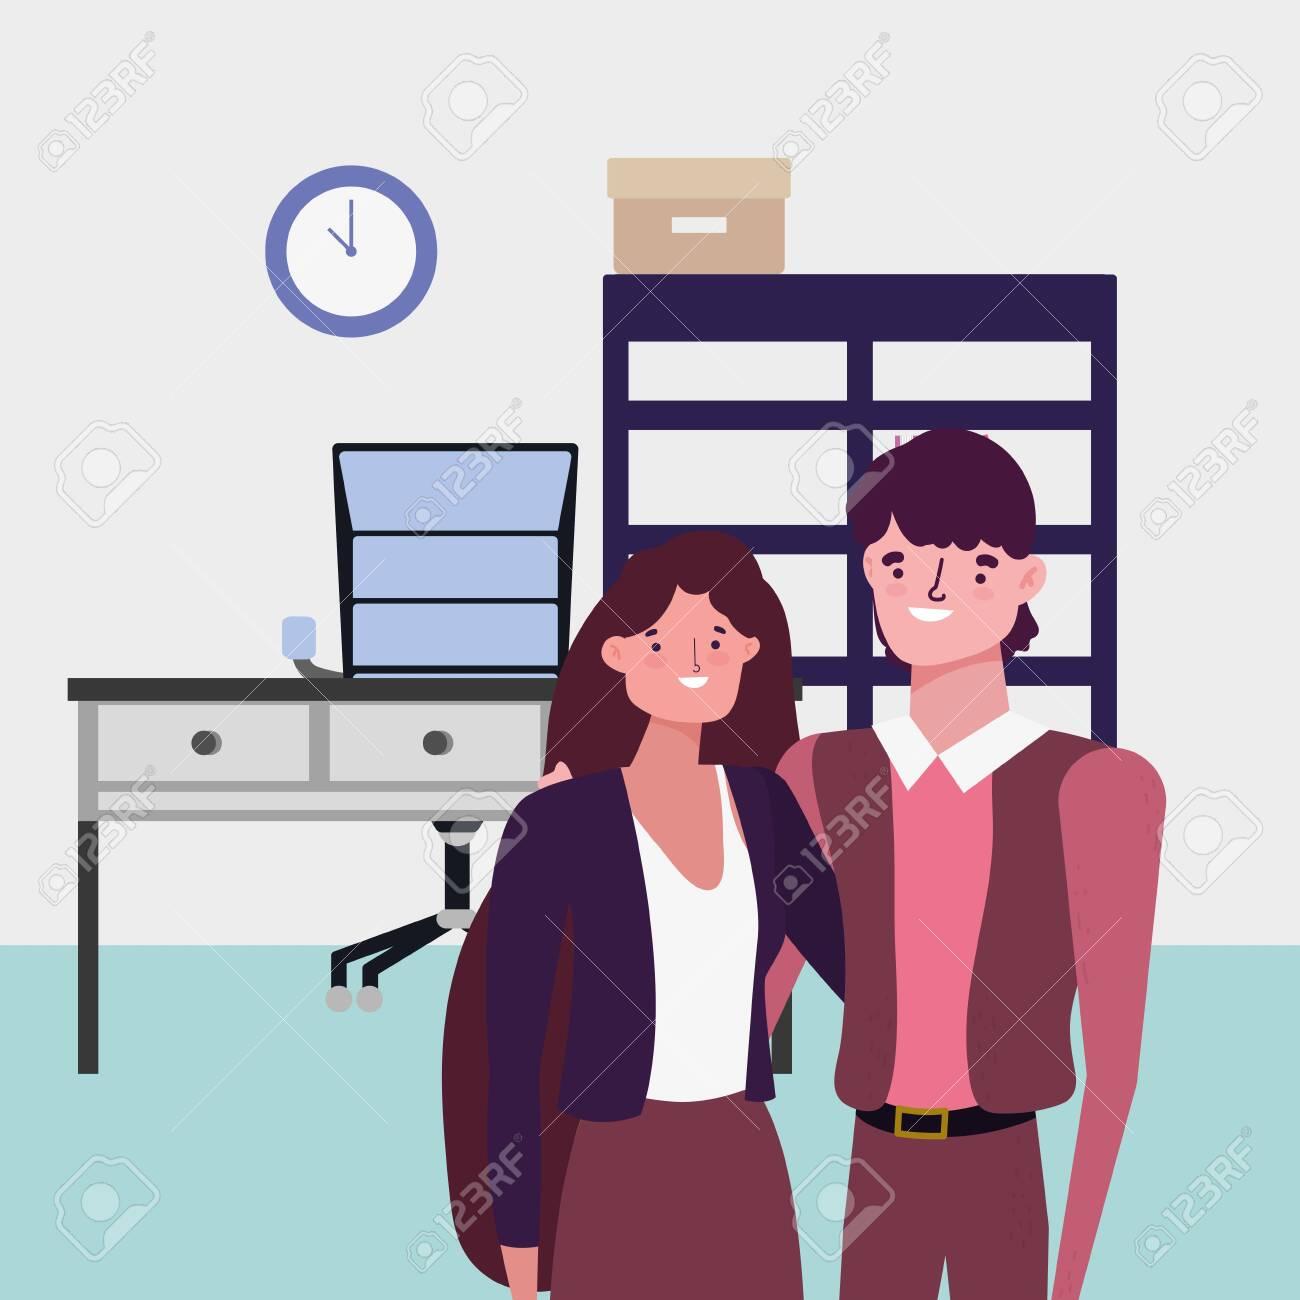 Businessman and businesswoman avatar design - 135853481